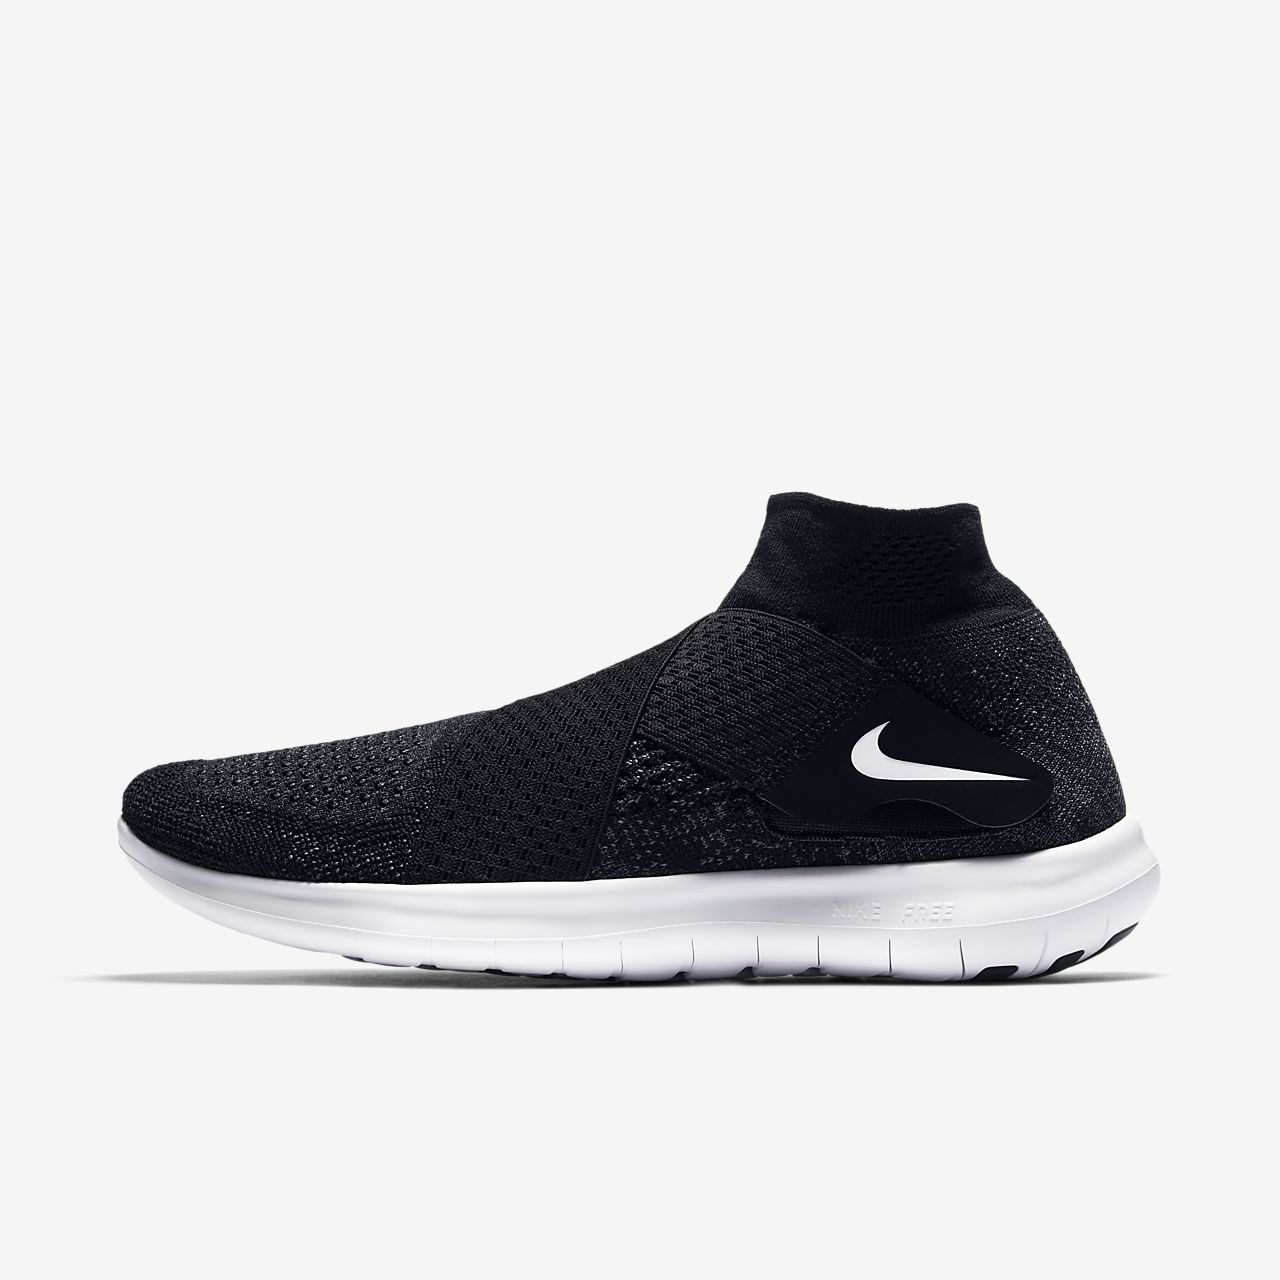 Nike - Gratuit Rn Flyknit 2017 Chaussures De Course - Femmes - Chaussures - Noir - 39 tmHwHx